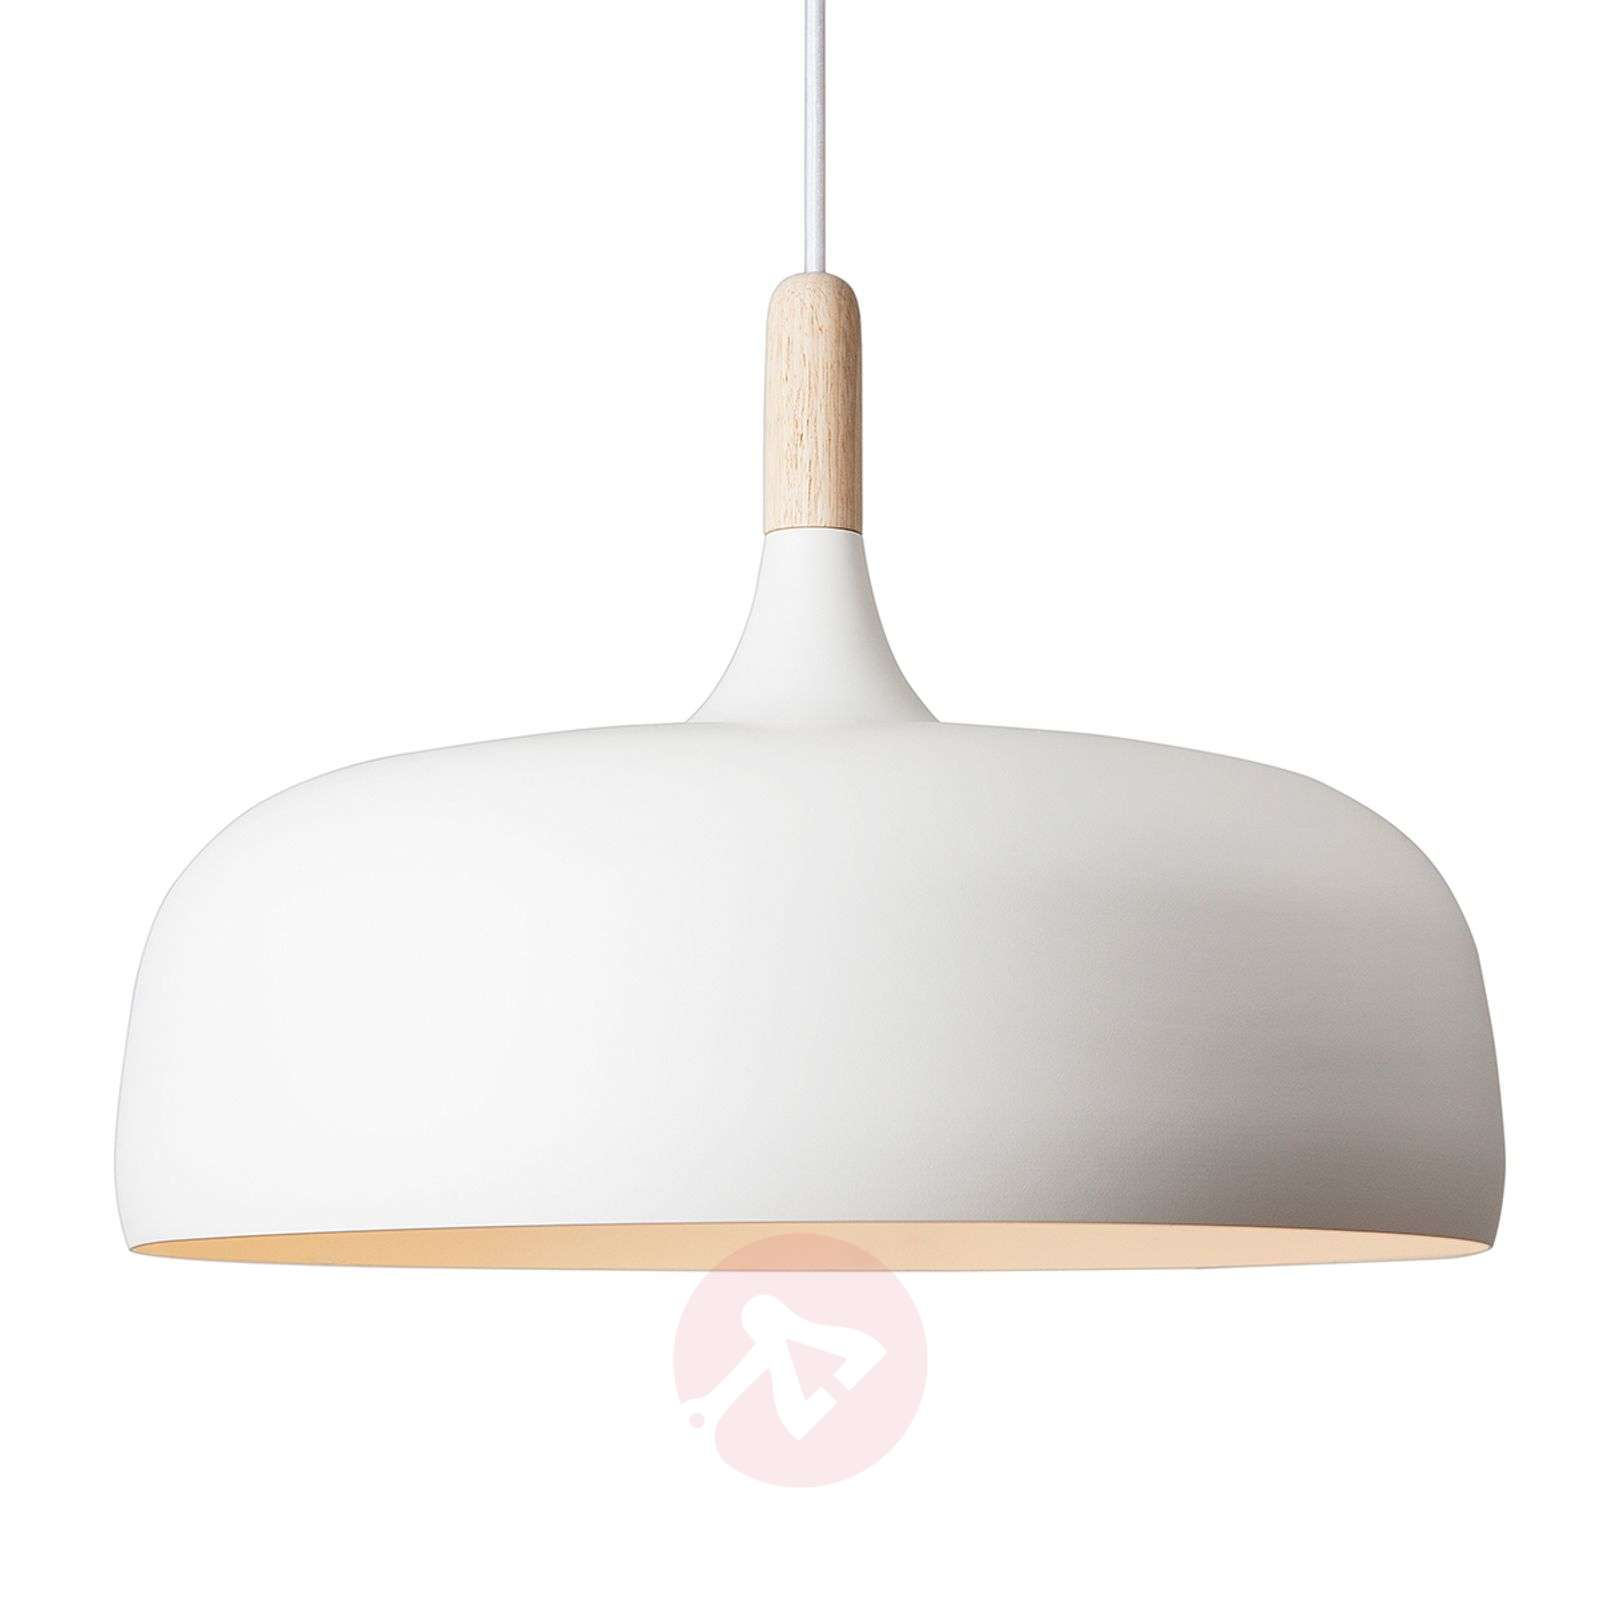 Hanging light Acorn made of aluminium in white-7013039-01